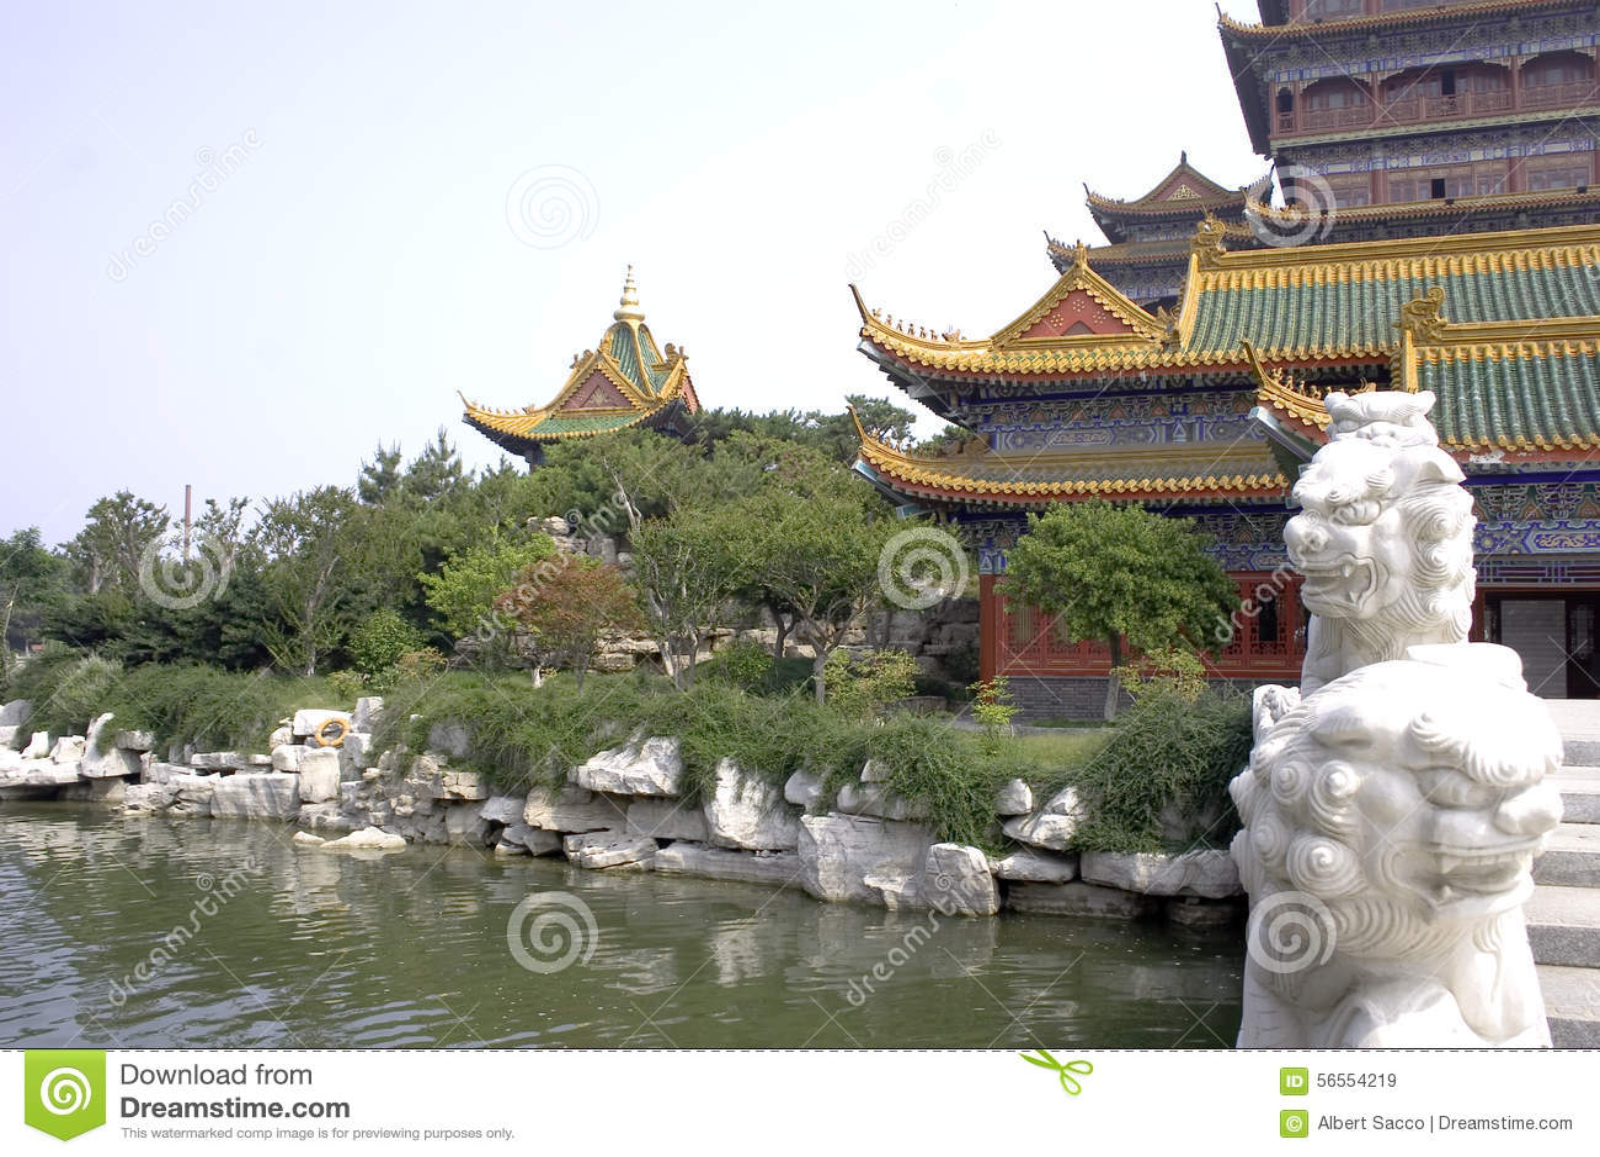 Download κινεζικό χωριό στοκ εικόνα. εικόνα από ancientness, κινεζικά - 56554219